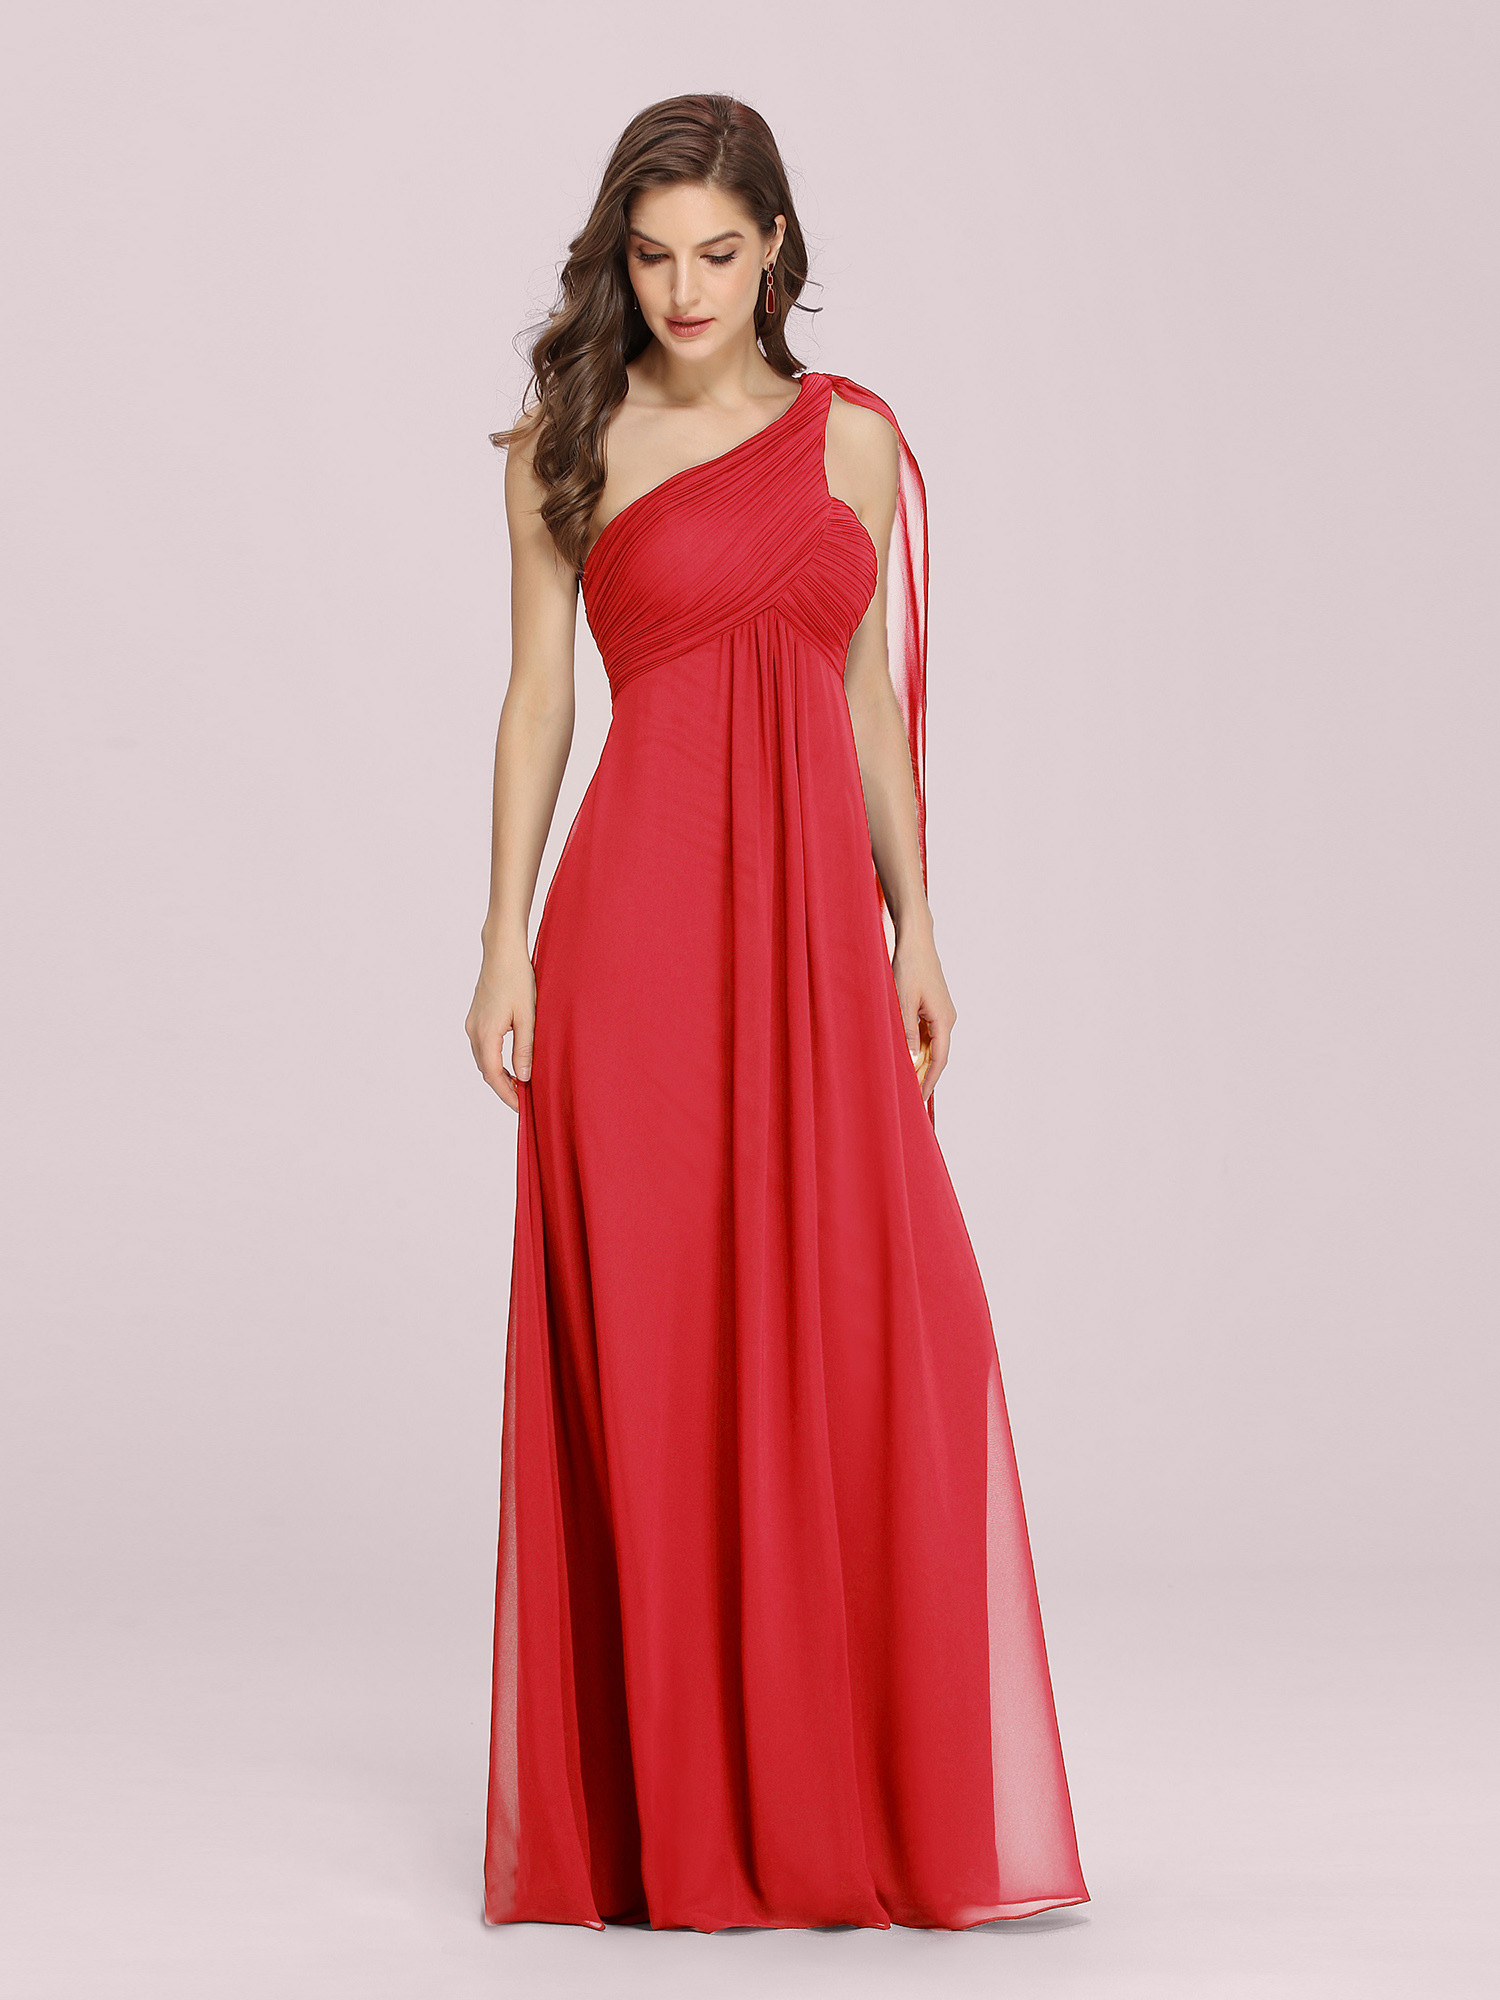 Ever-Pretty-Bridesmaid-Dresses-Chiffon-Ribbon-Long-Formal-Cocktail-Party-Dress thumbnail 30